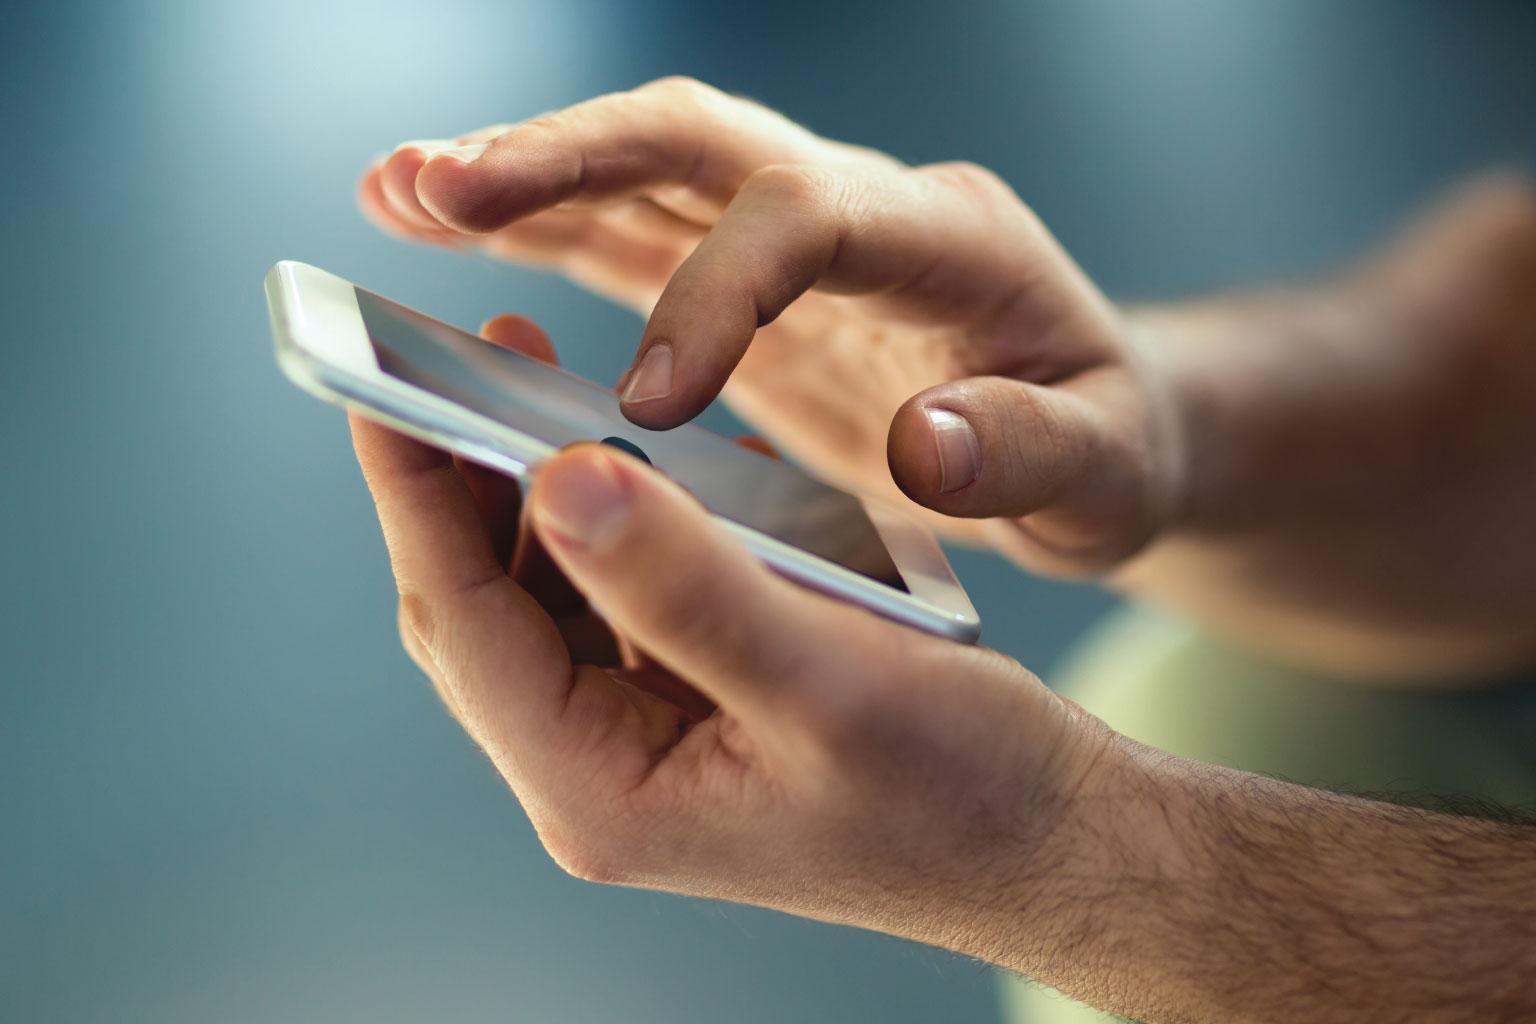 Wersja mobilna LEX-a